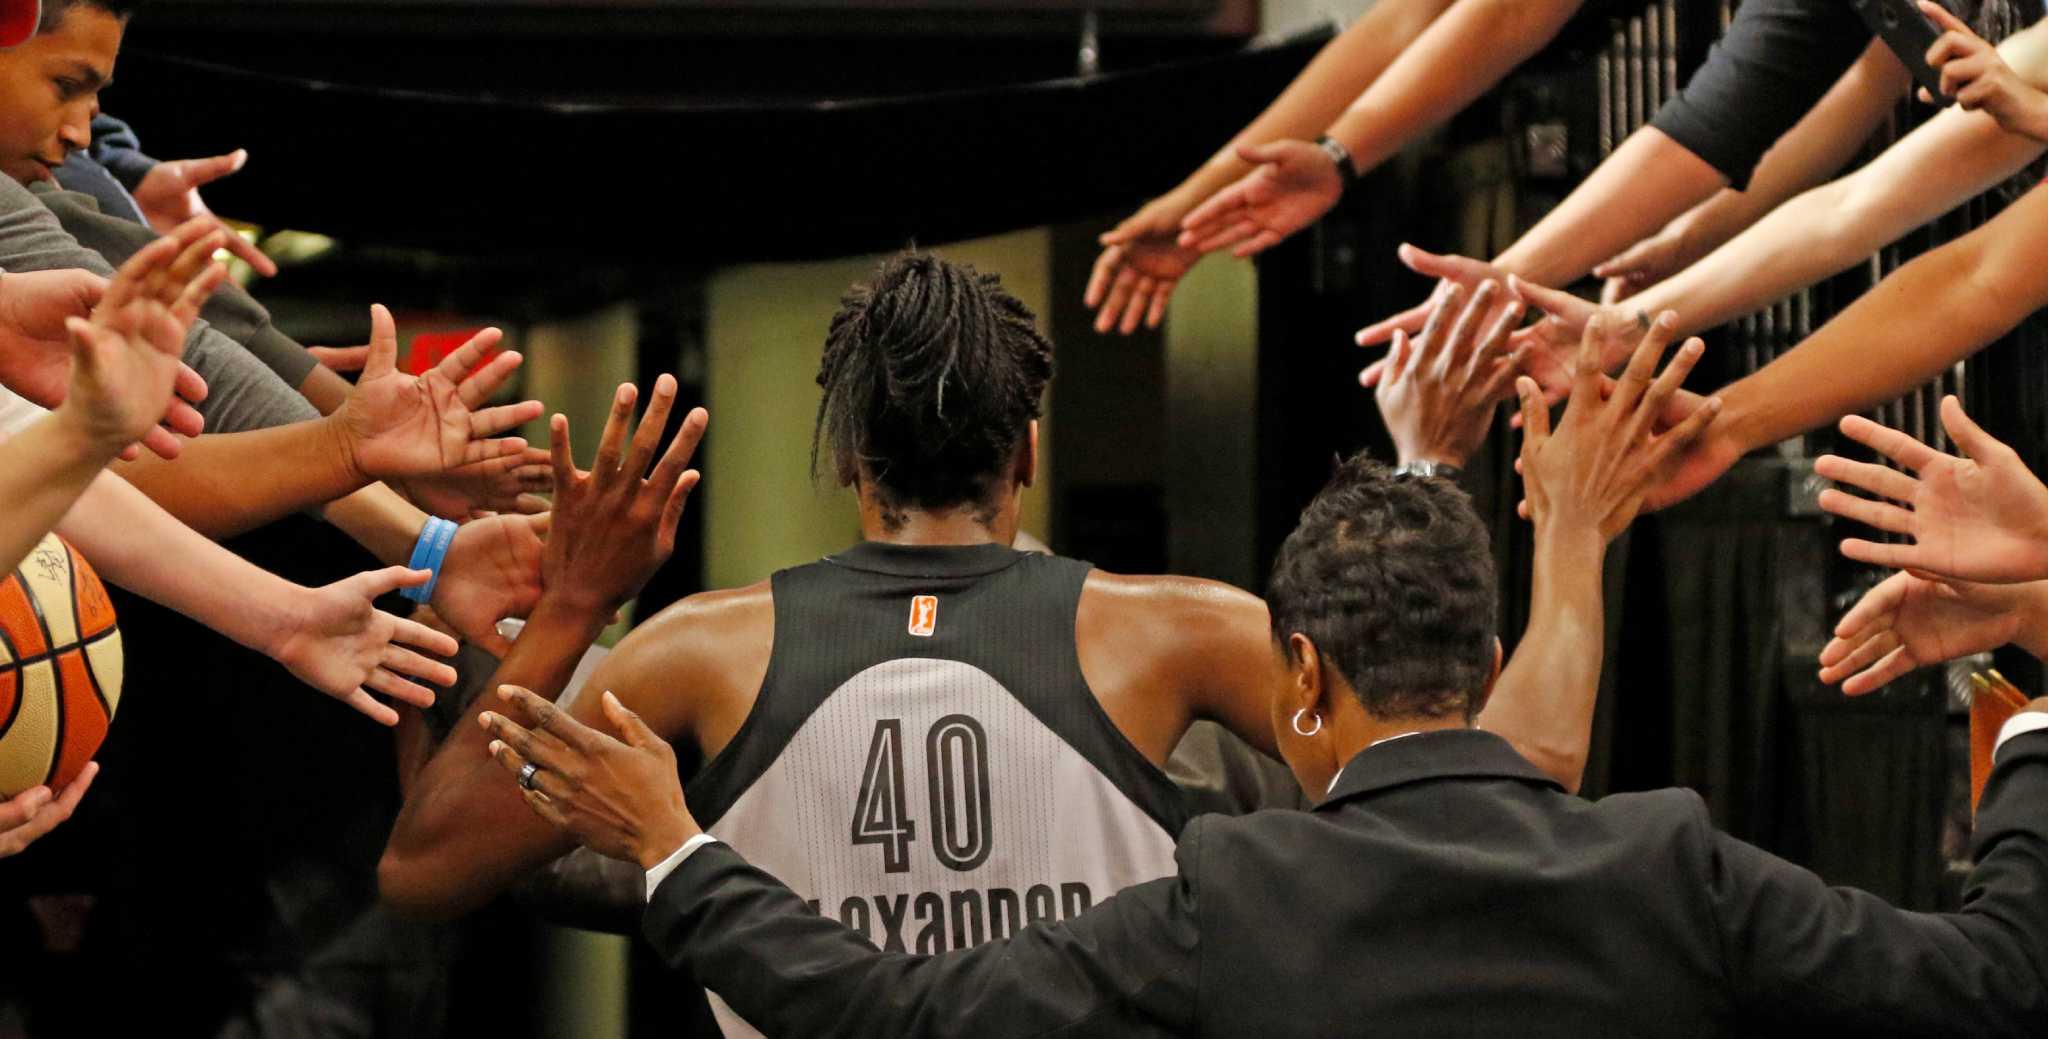 WNBA preview: Stars at Los Angeles - San Antonio Express-News